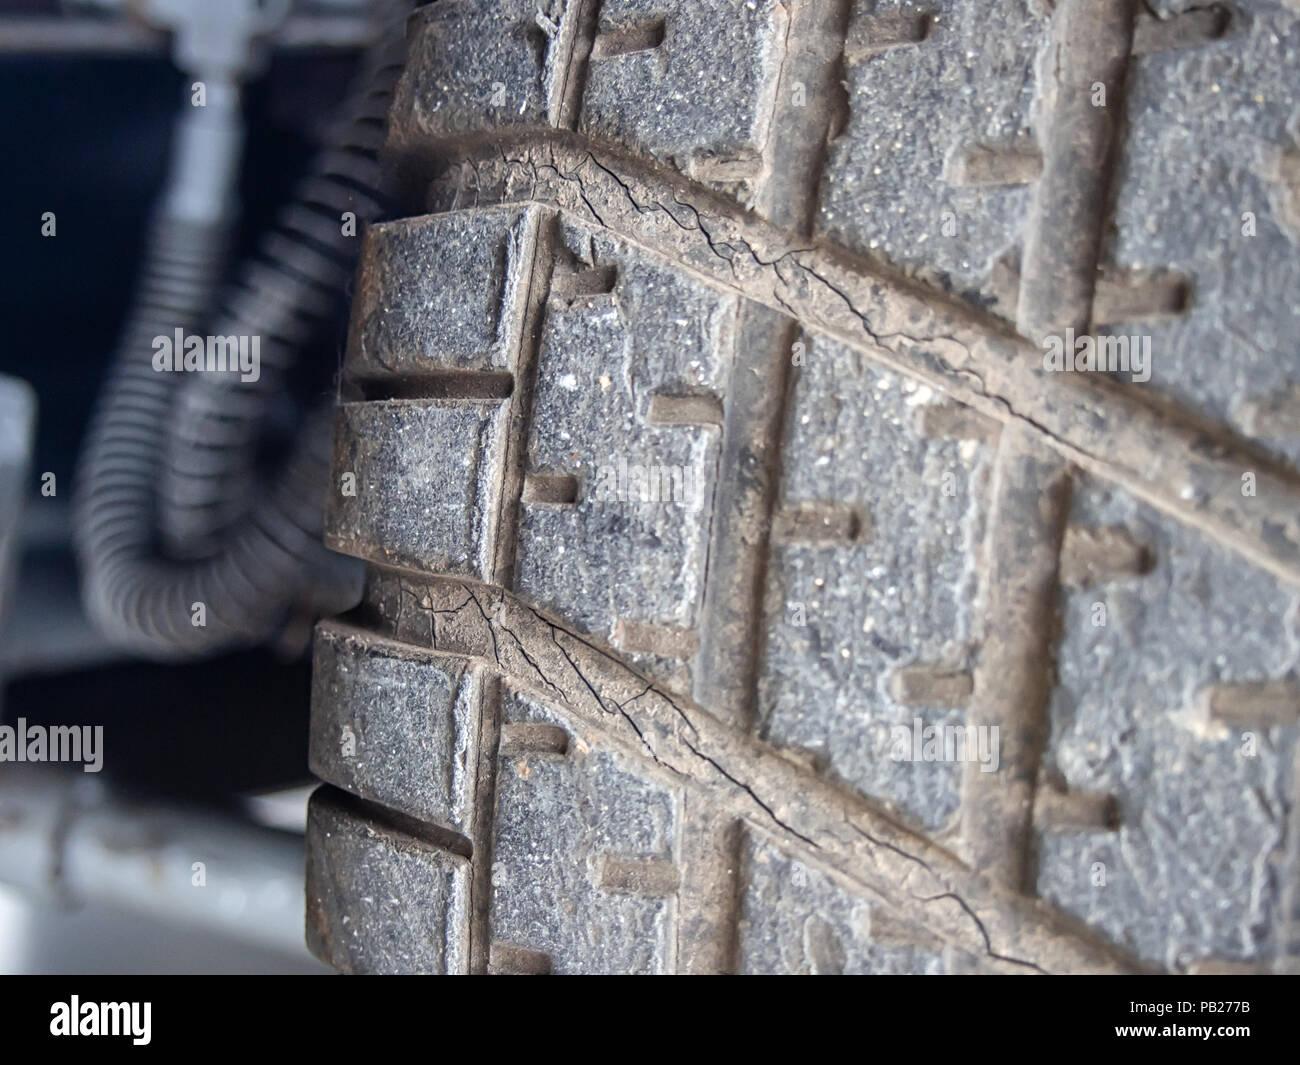 Bad tread of a tire closeup - Stock Image